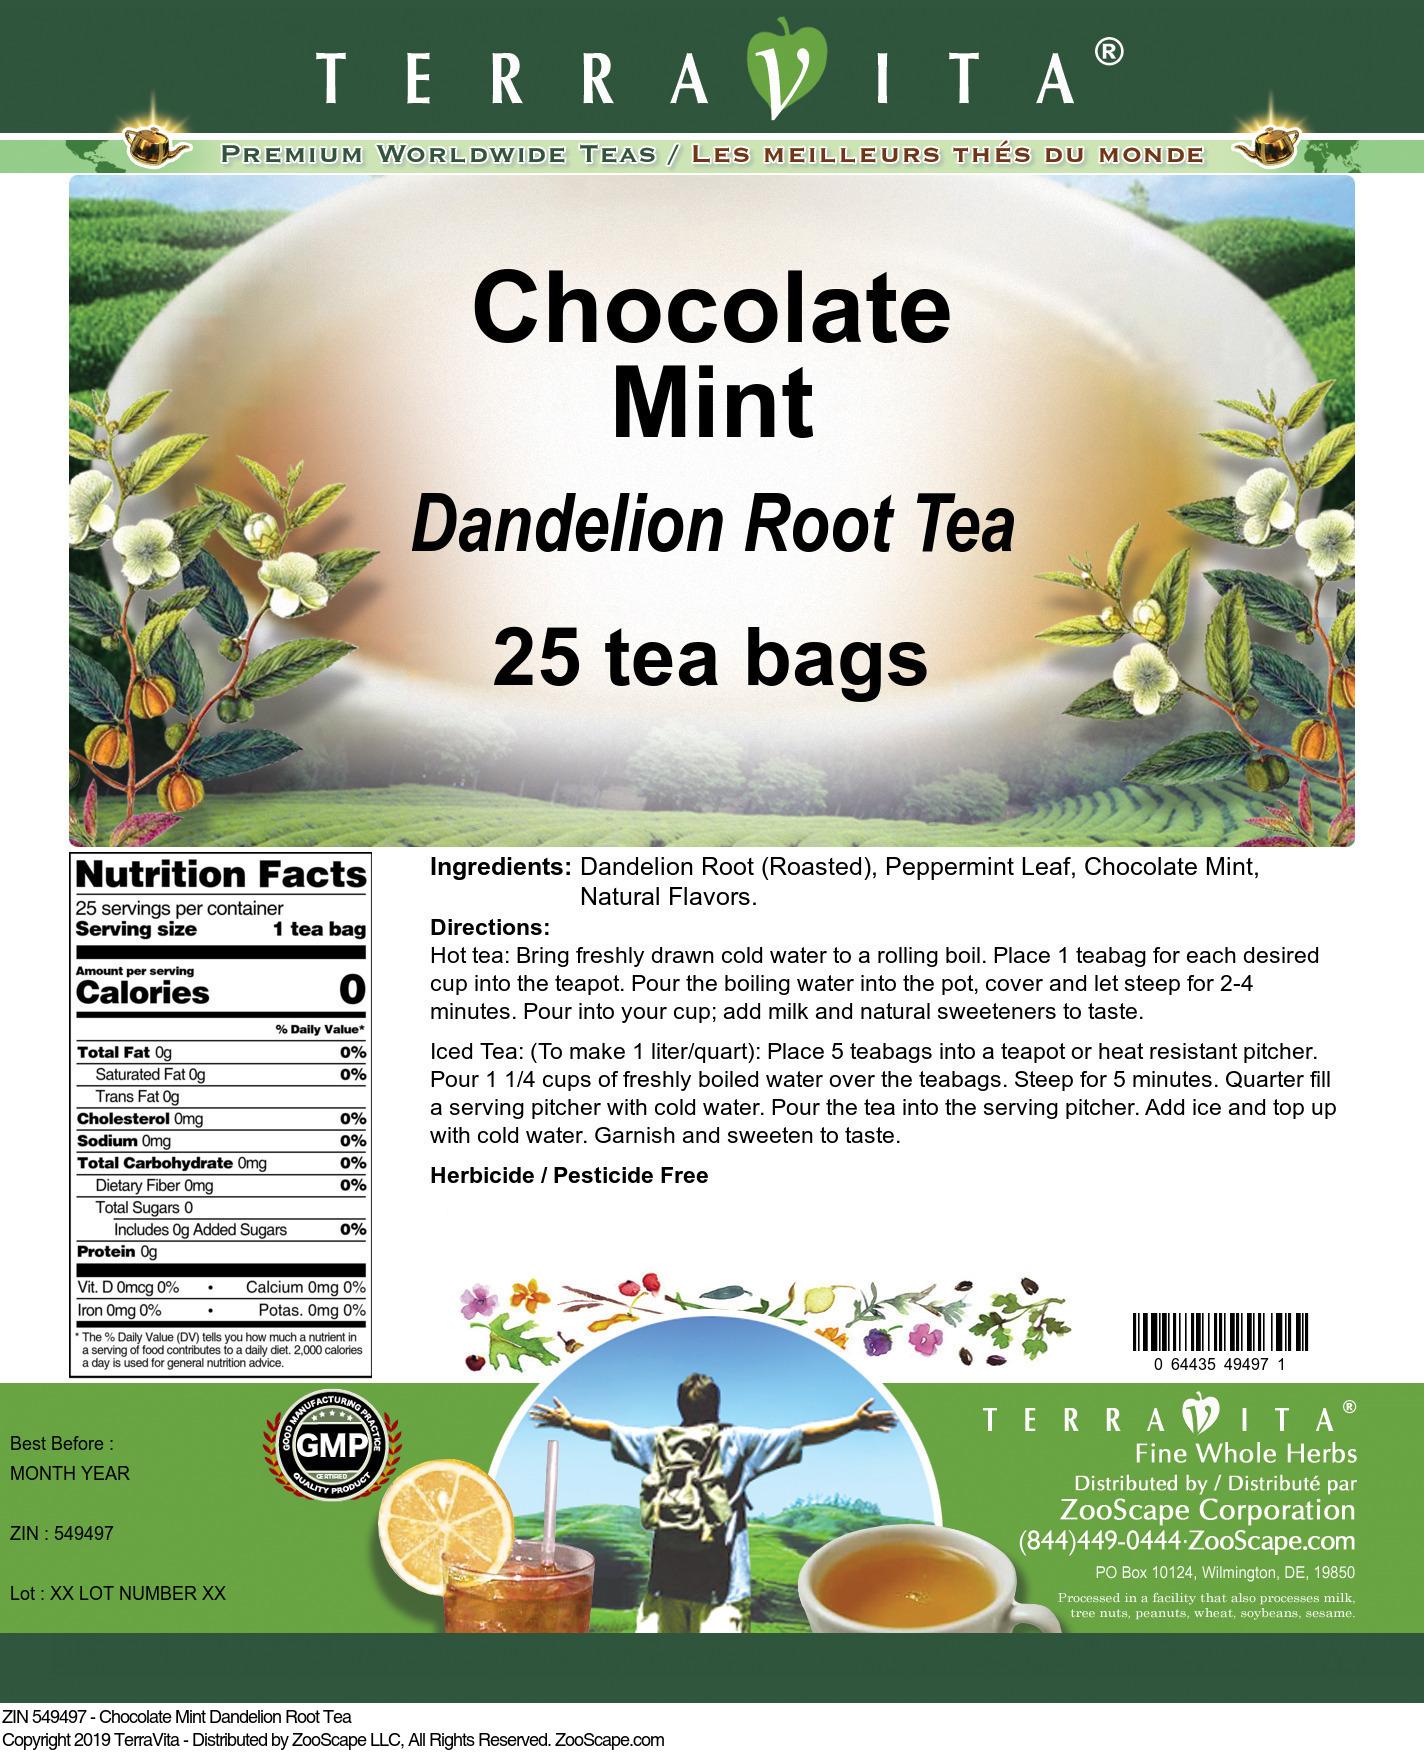 Chocolate Mint Dandelion Root Tea